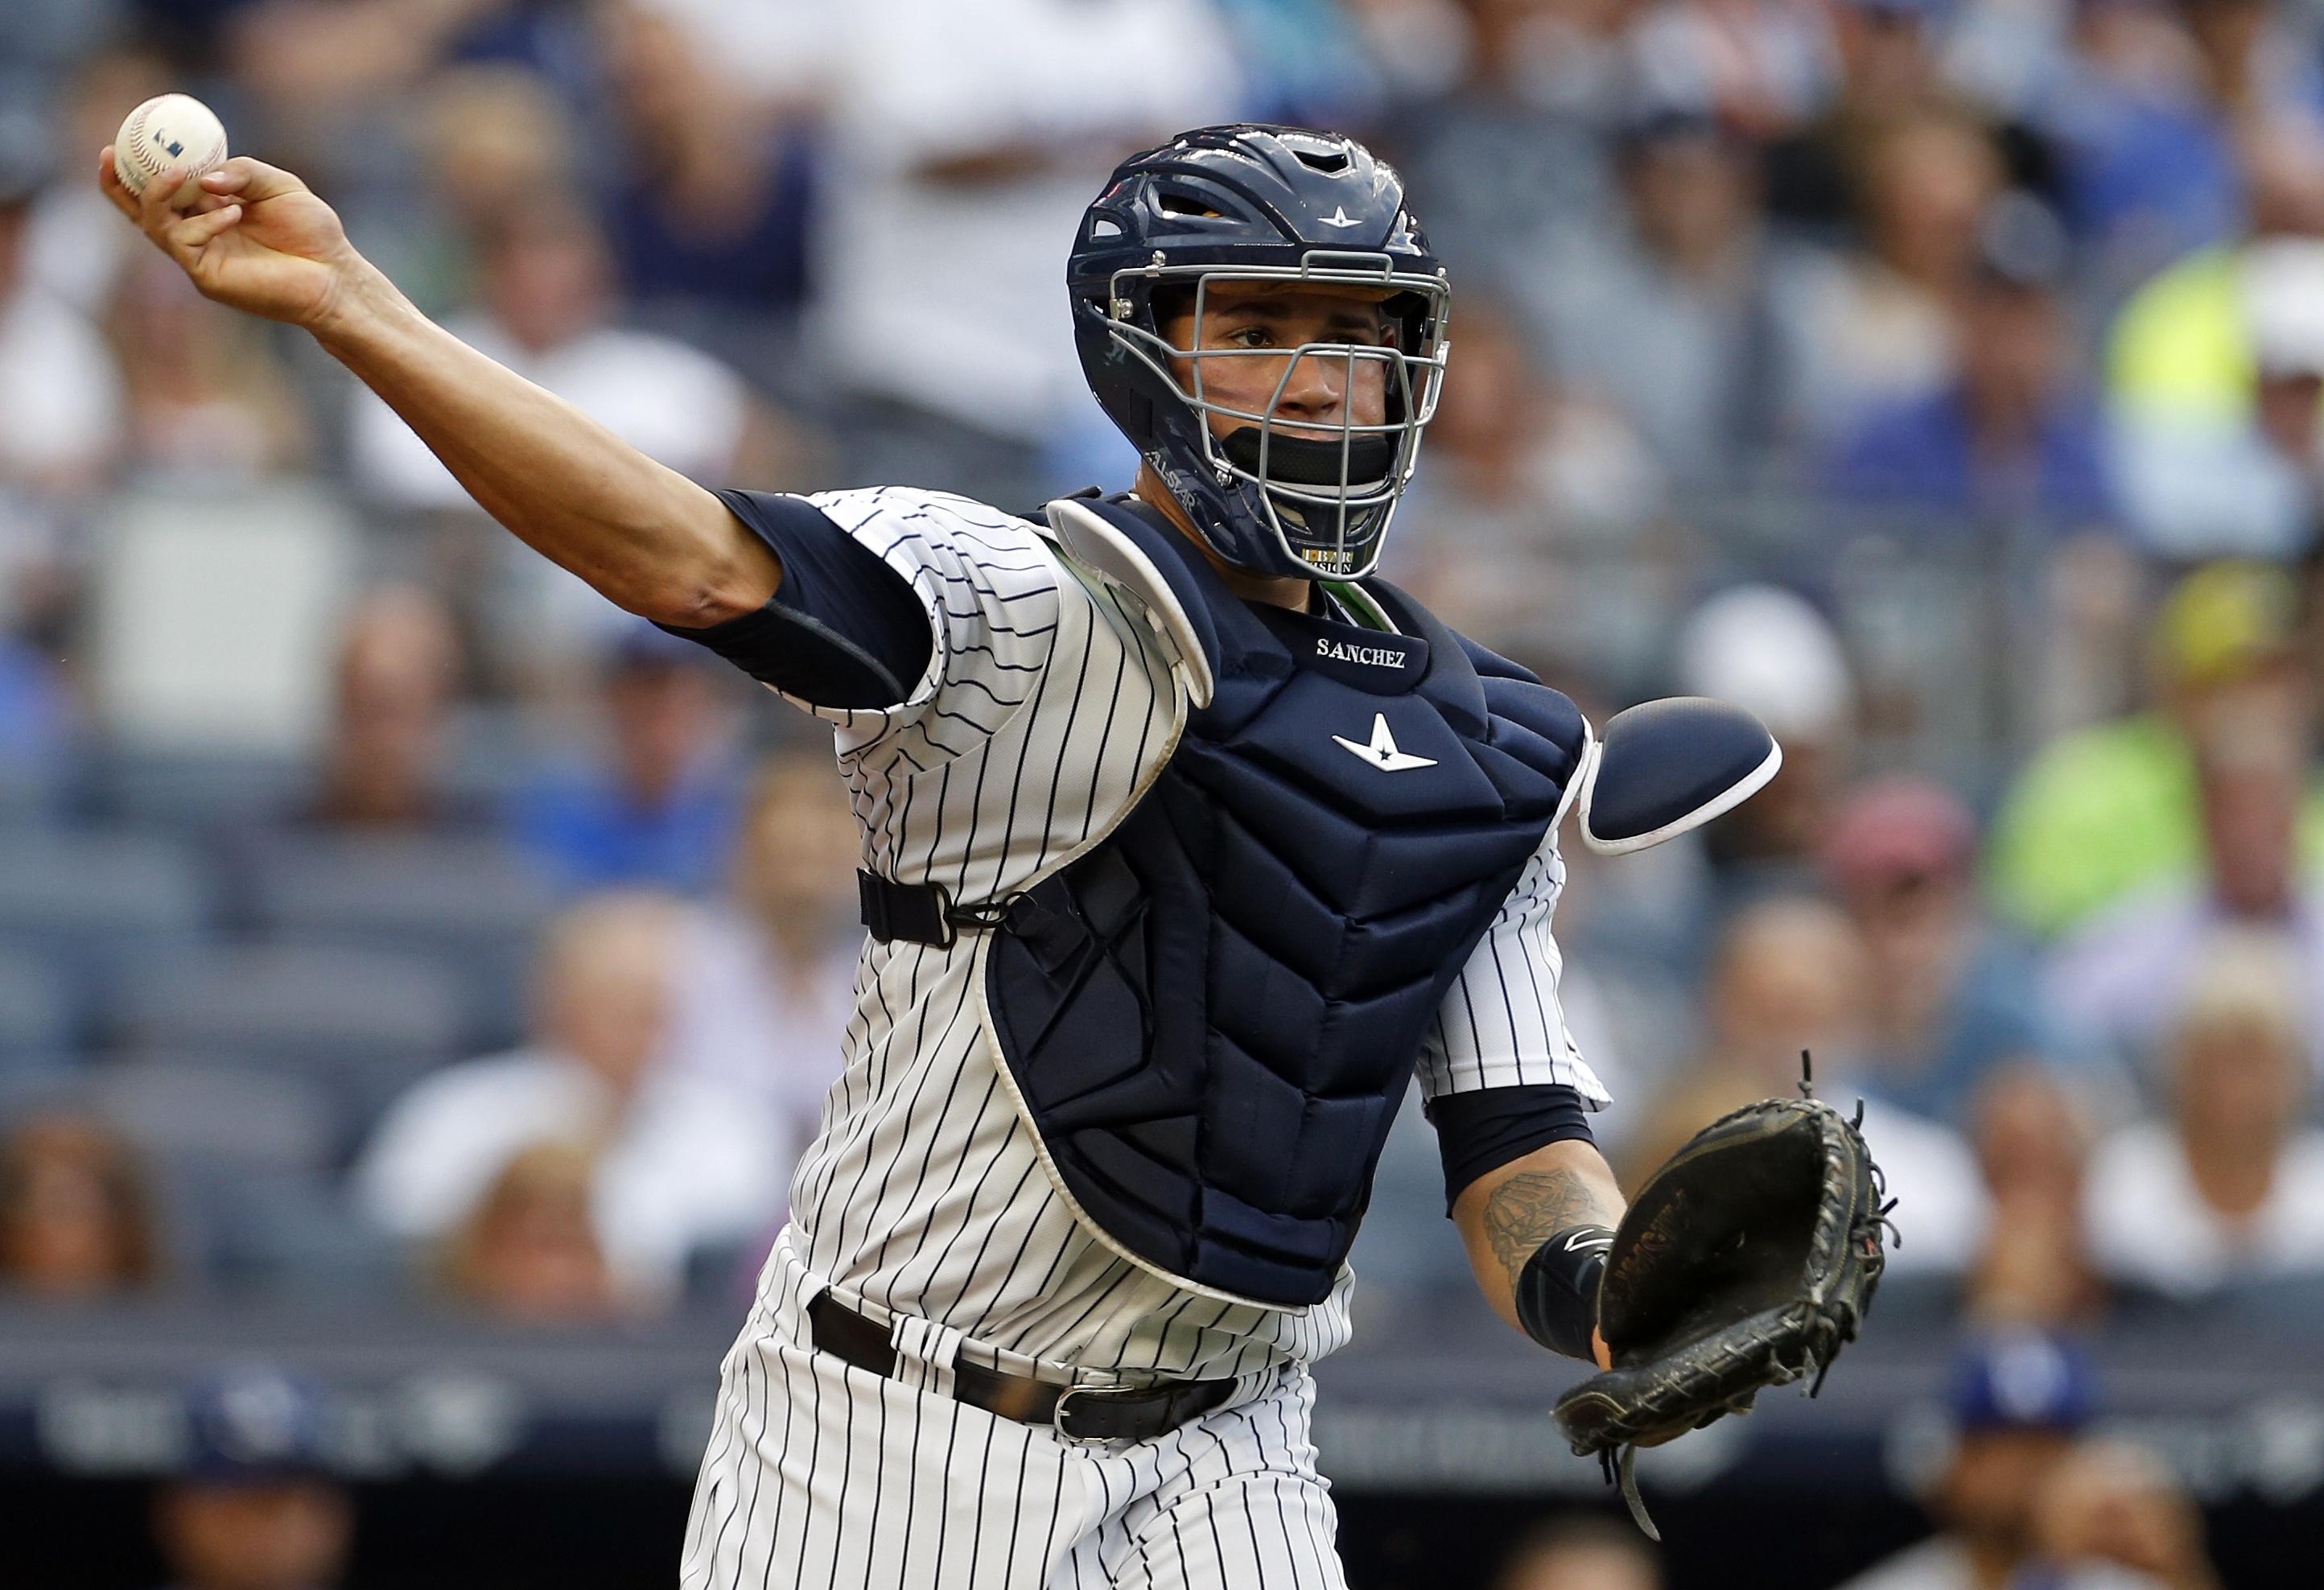 MLB Player Rankings 2017: Catcher